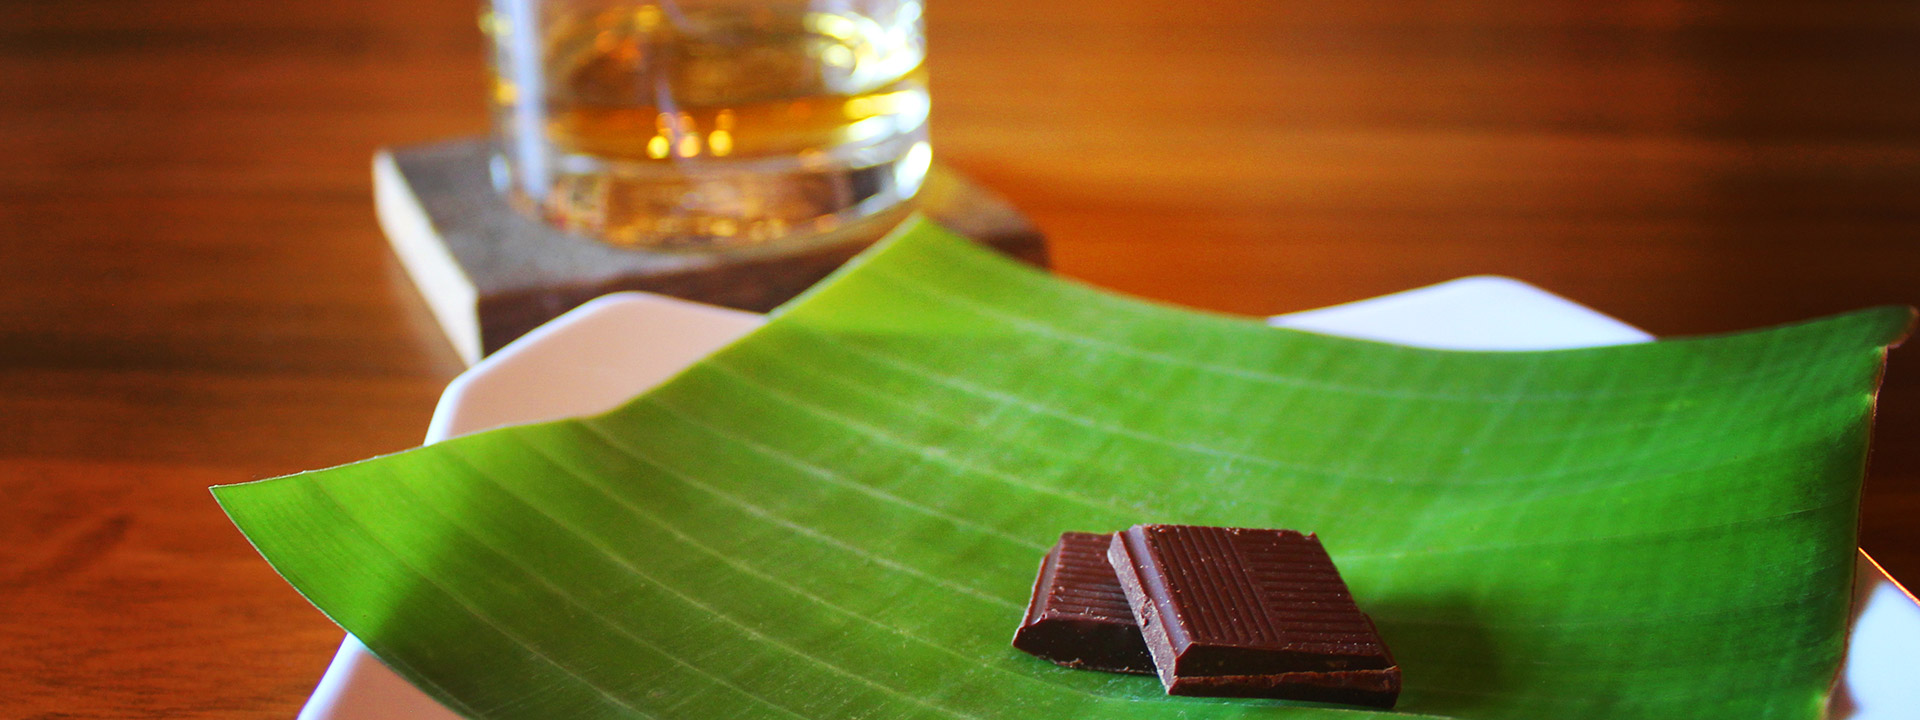 Choco - Chocolate Shop